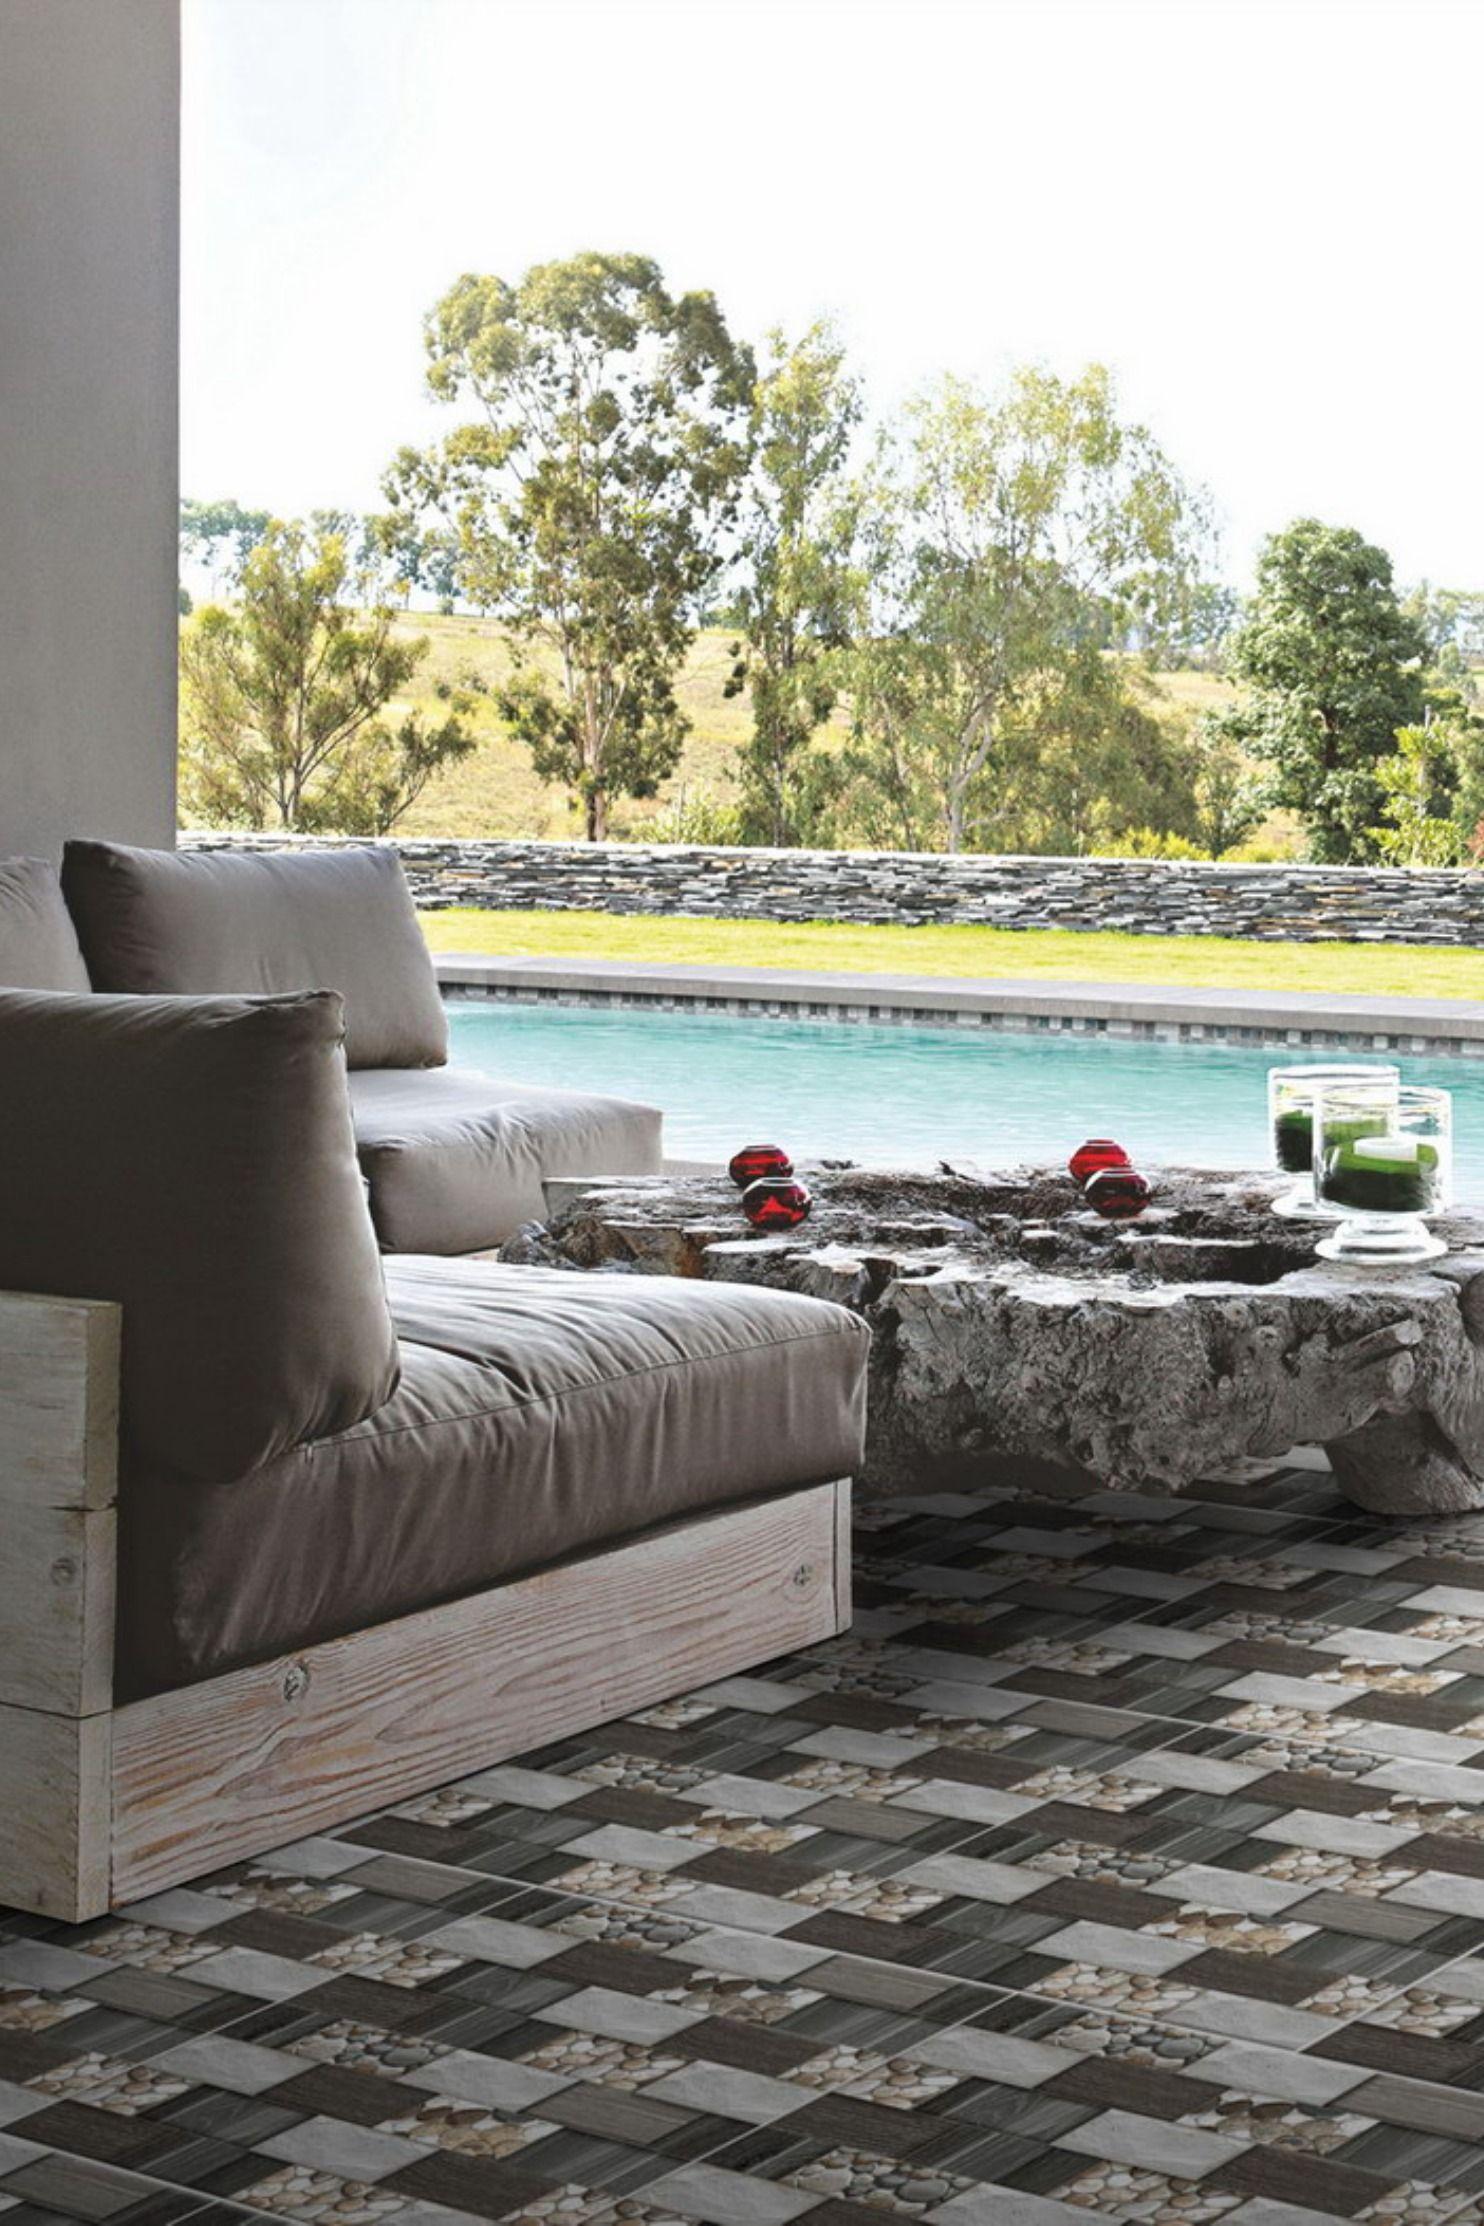 Sicily 50x50 Cm Di 2021 Desainer Interior Ubin Lantai Interior Motif keramik lantai garasi